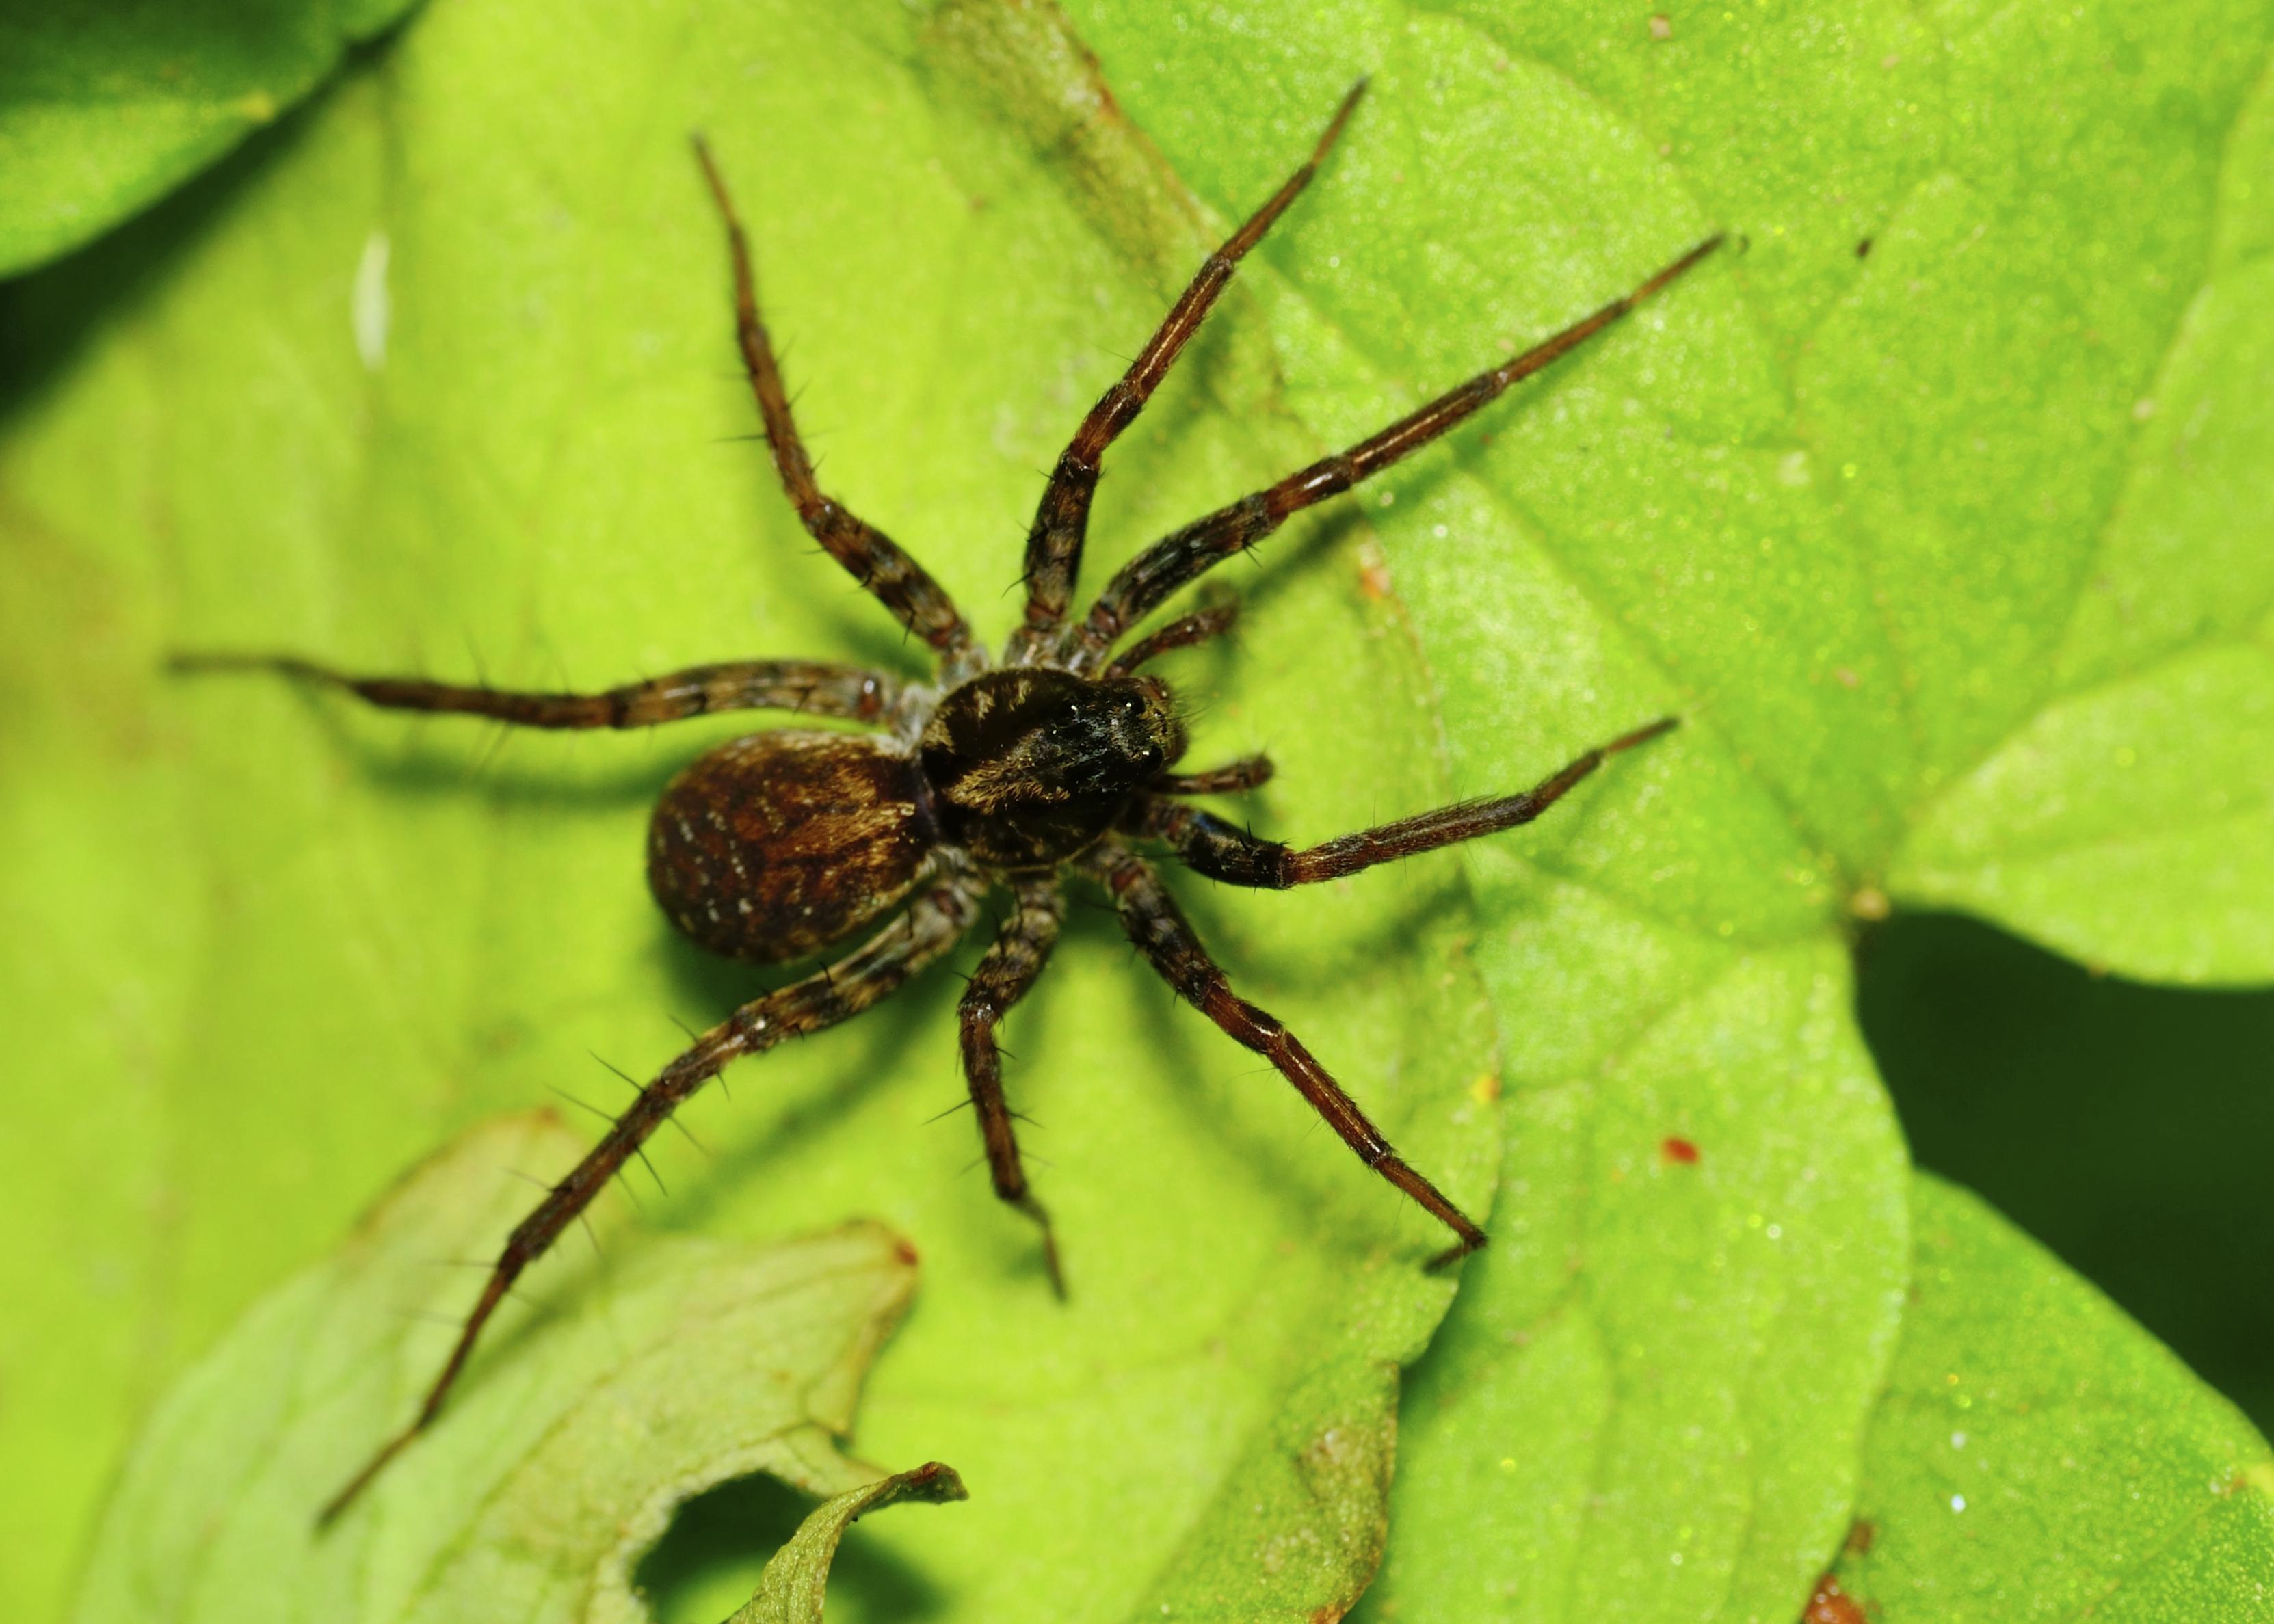 Poisonous Spiders Native To Illinois